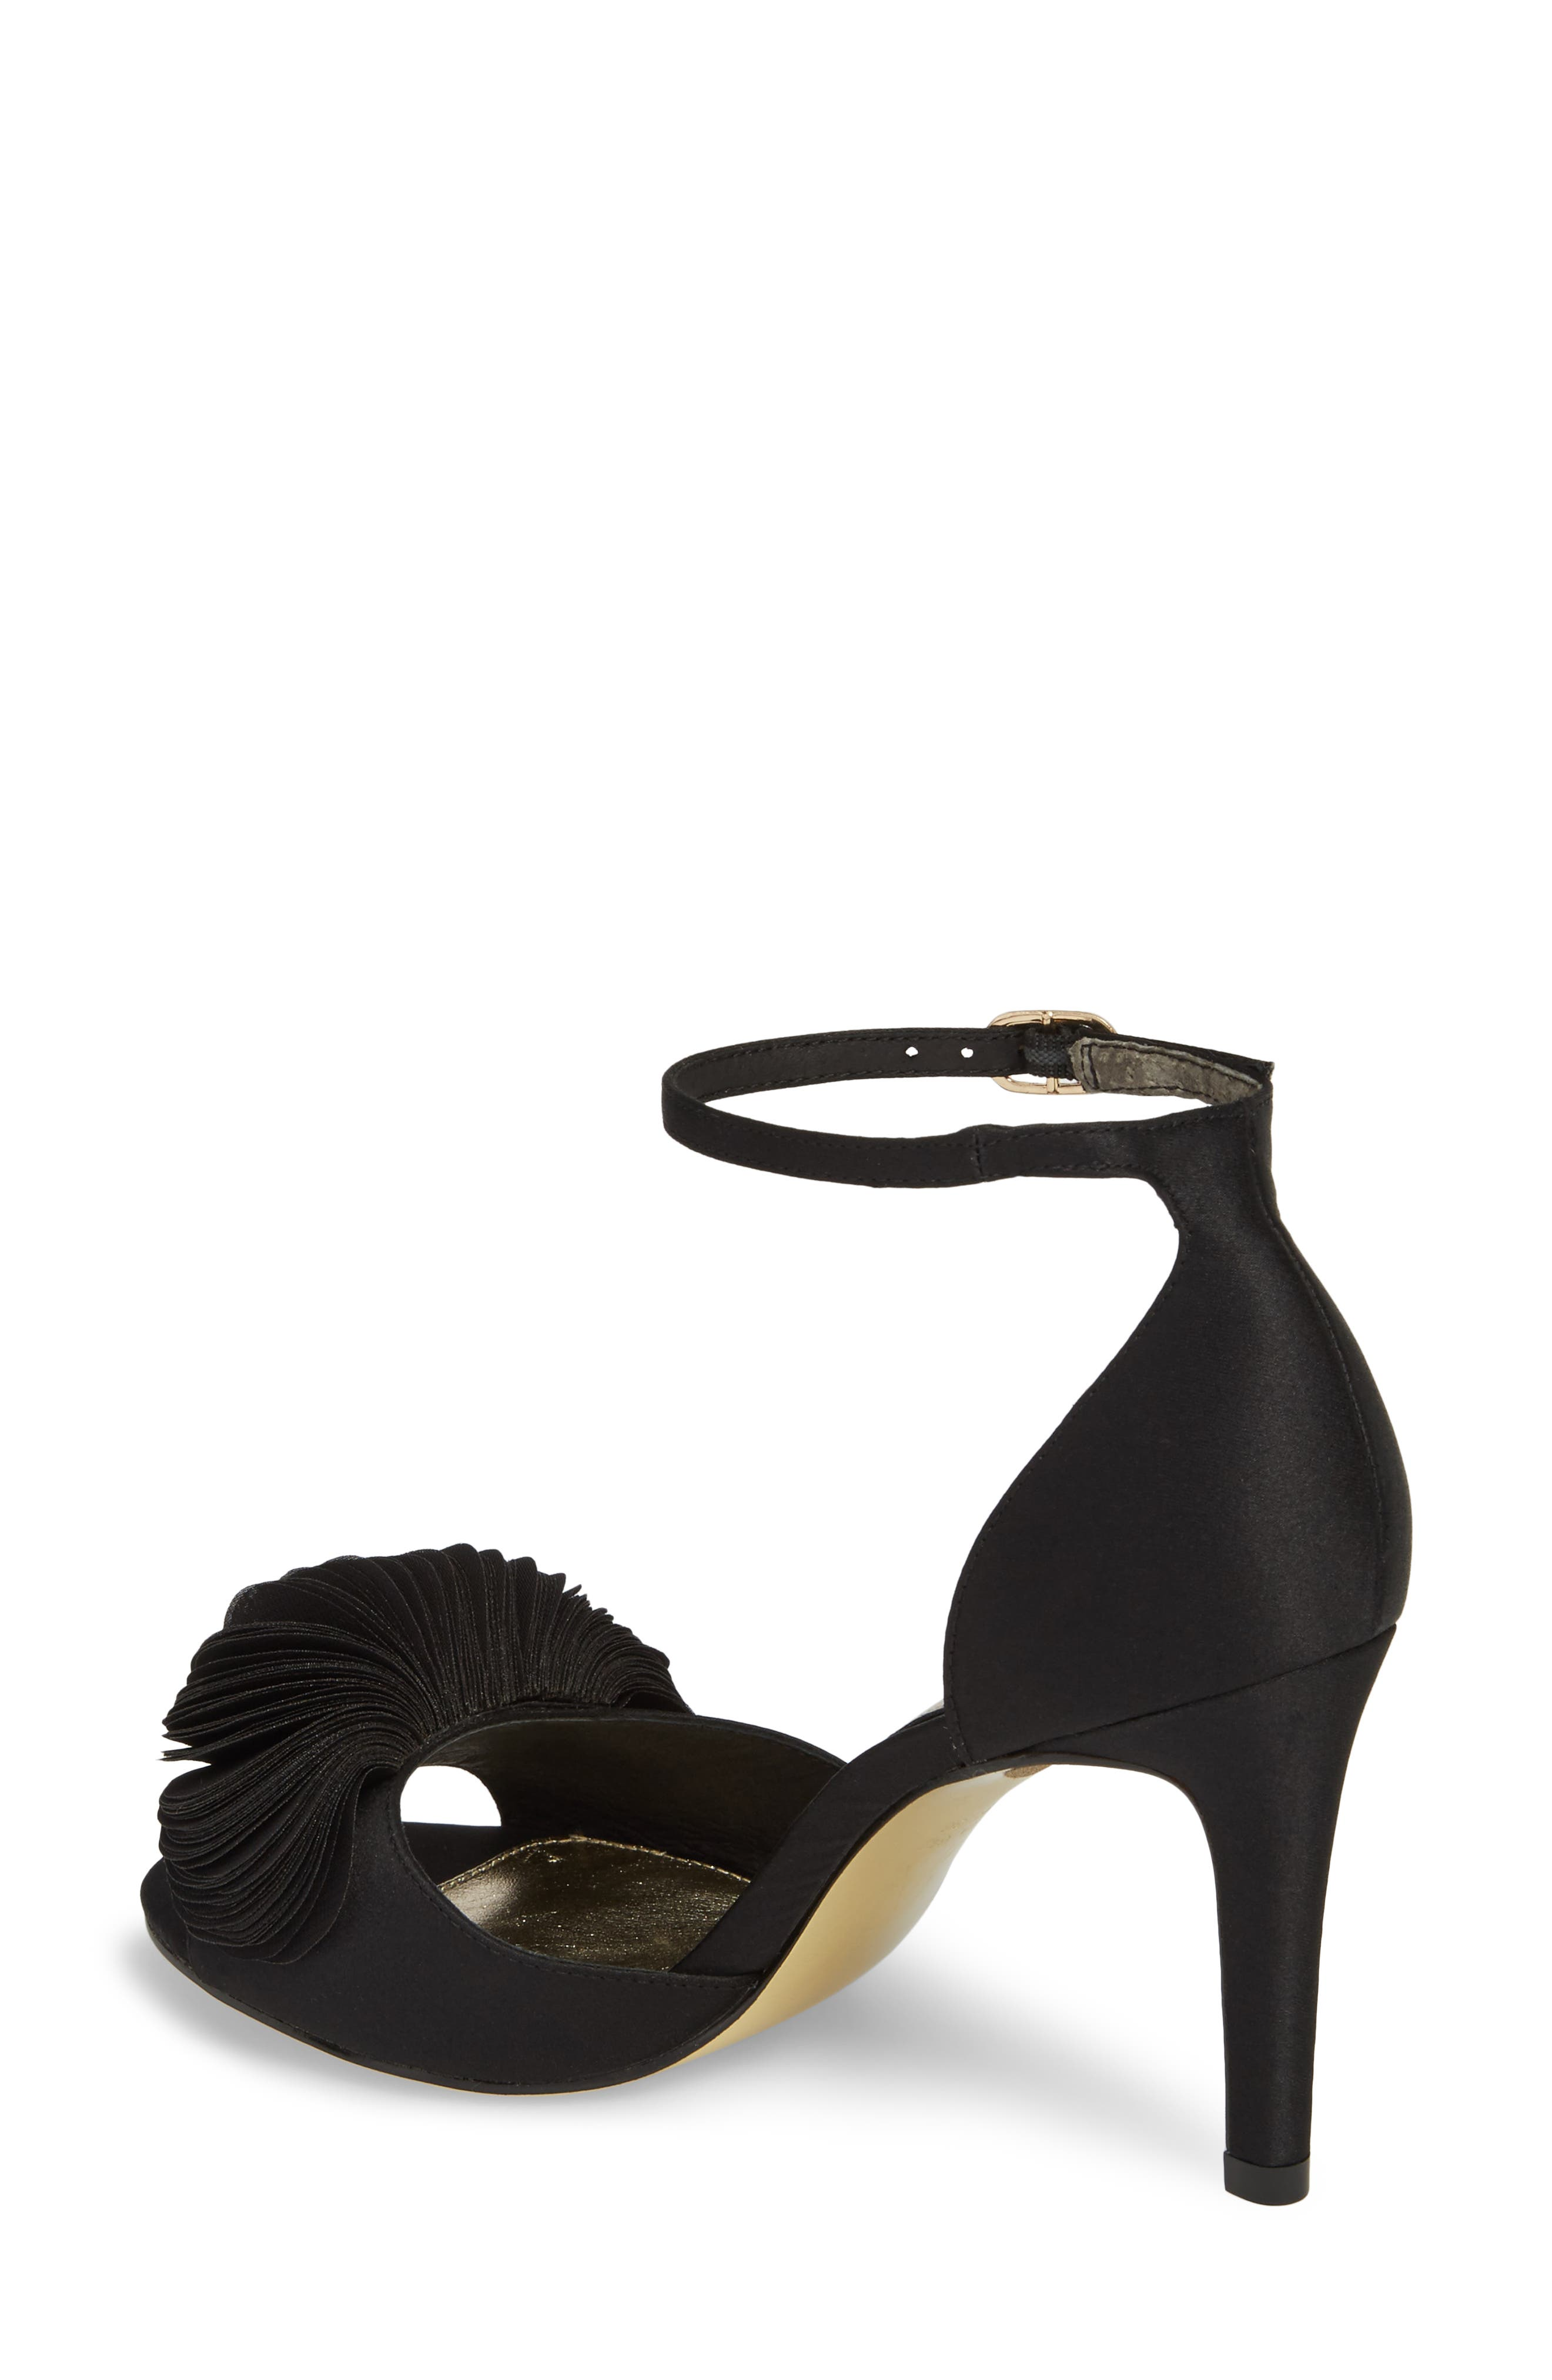 Gracie Ankle Strap Sandal,                             Alternate thumbnail 2, color,                             001